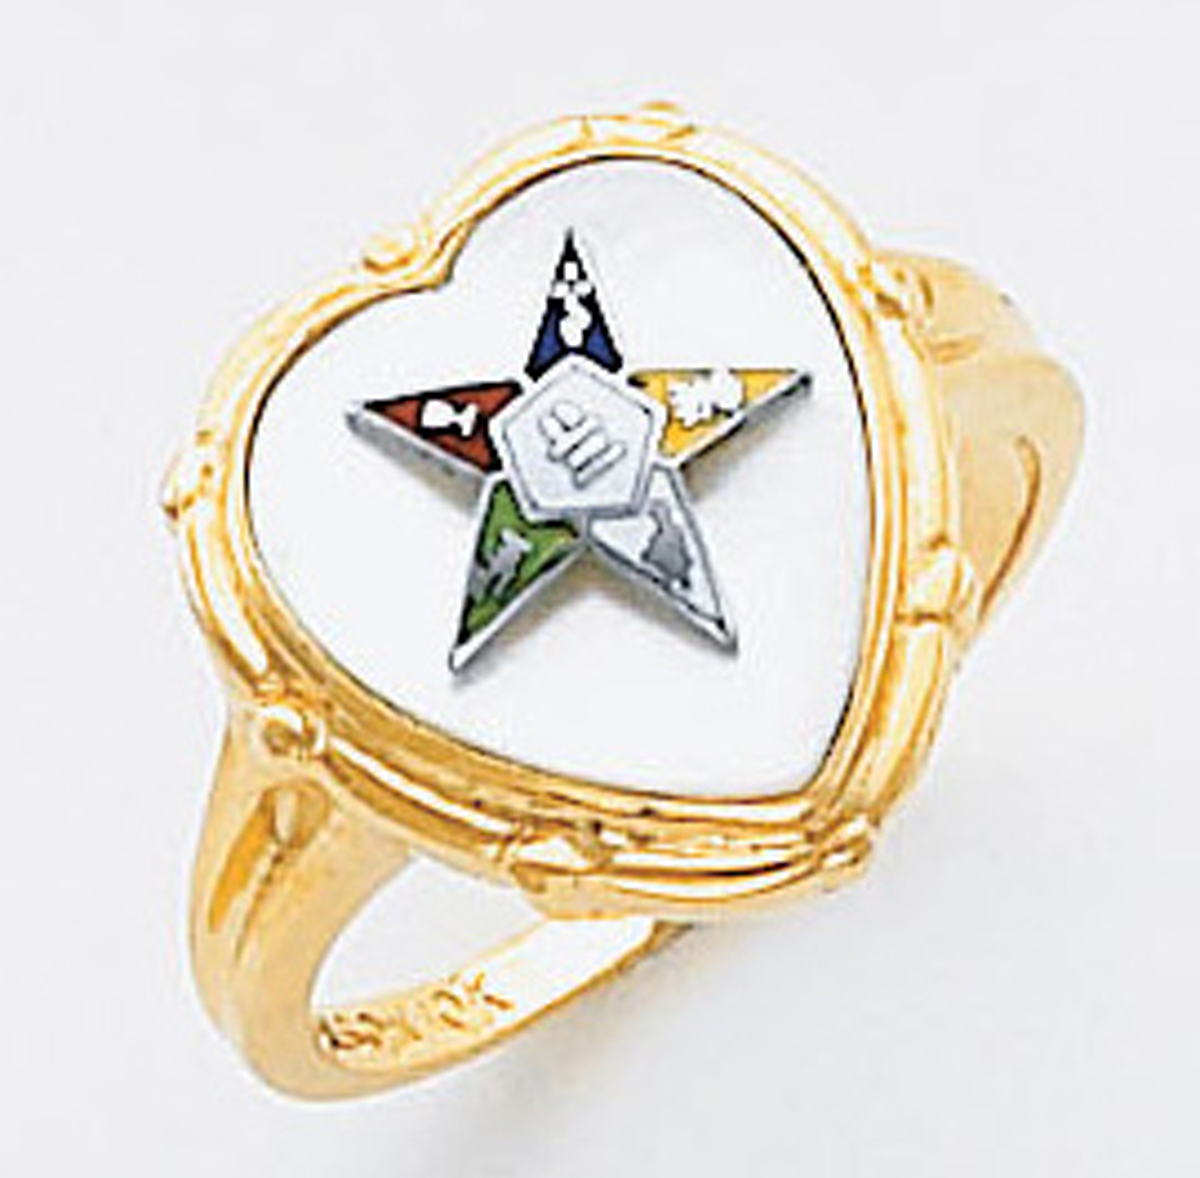 Order of the Eastern Star Ring Macoy Publishing Masonic Supply 5514